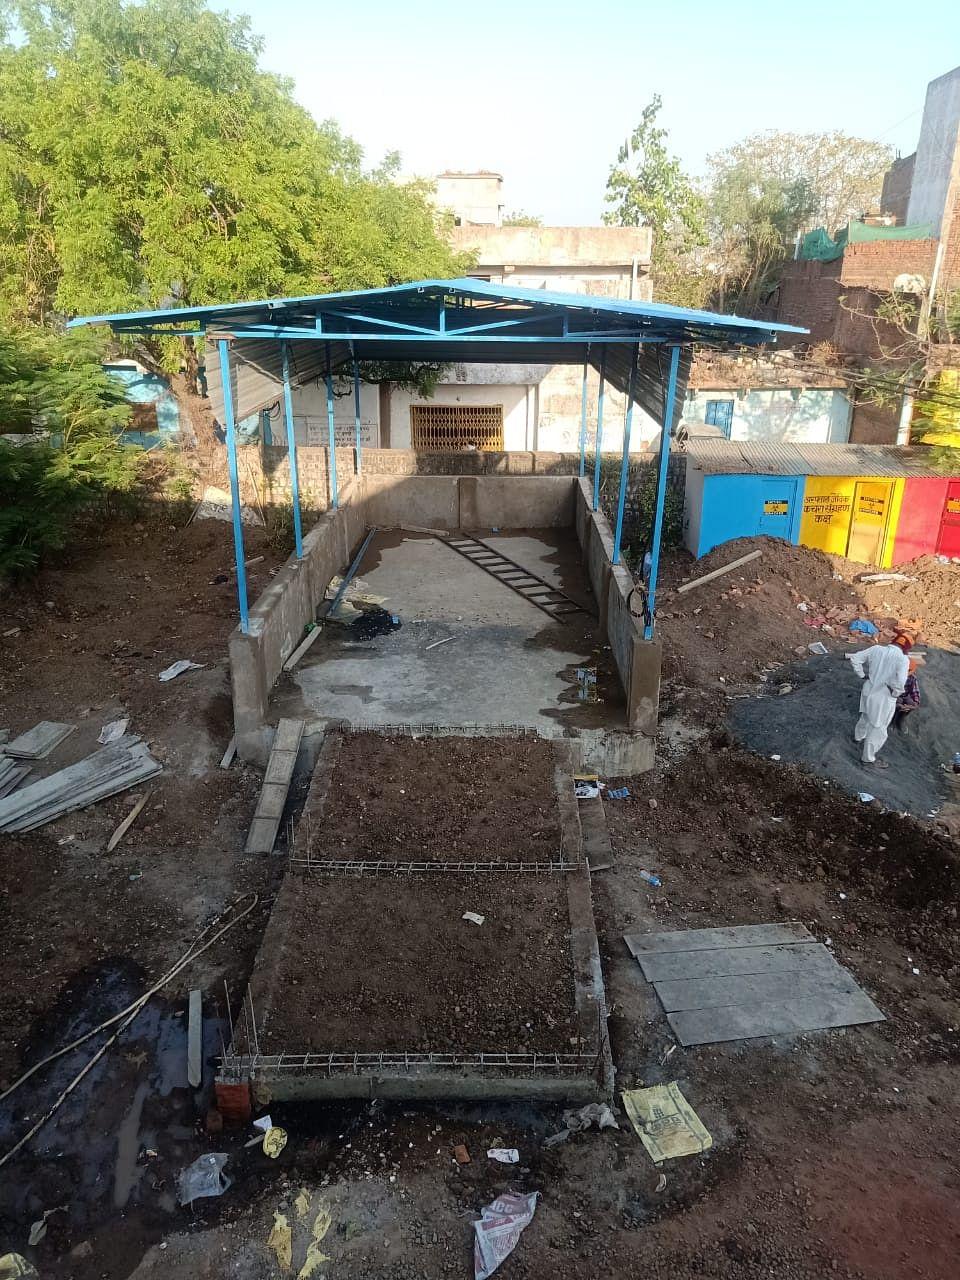 अशोकनगर अस्पताल में 15 मई तक शुरू होगा ऑक्सीजन प्लांट, तीन अन्य प्लांट प्रस्तावित